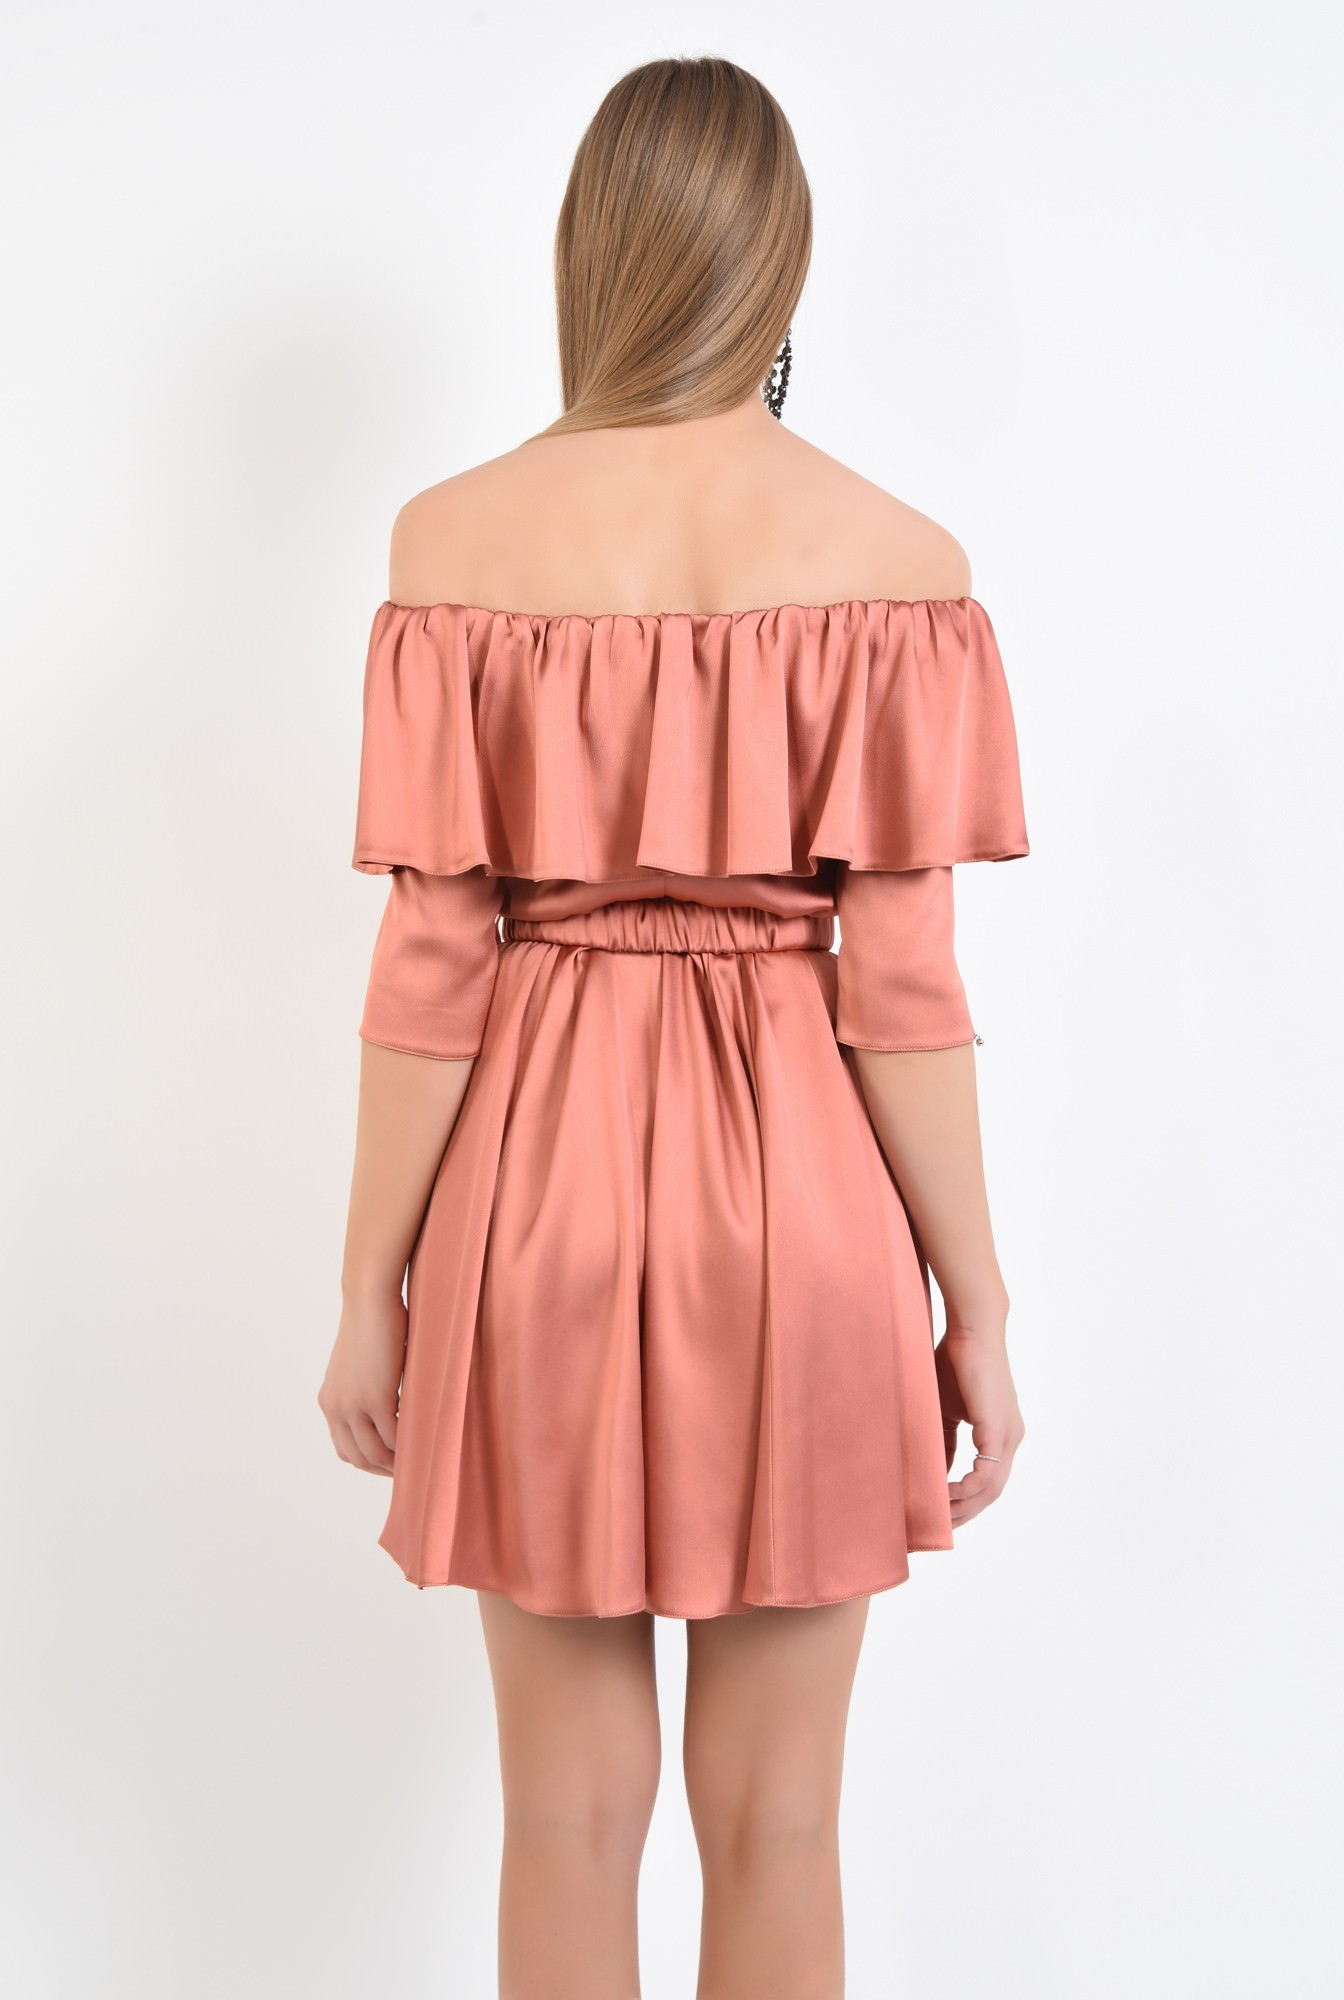 1 - rochie eleganta, scurta, clos, satin, curea